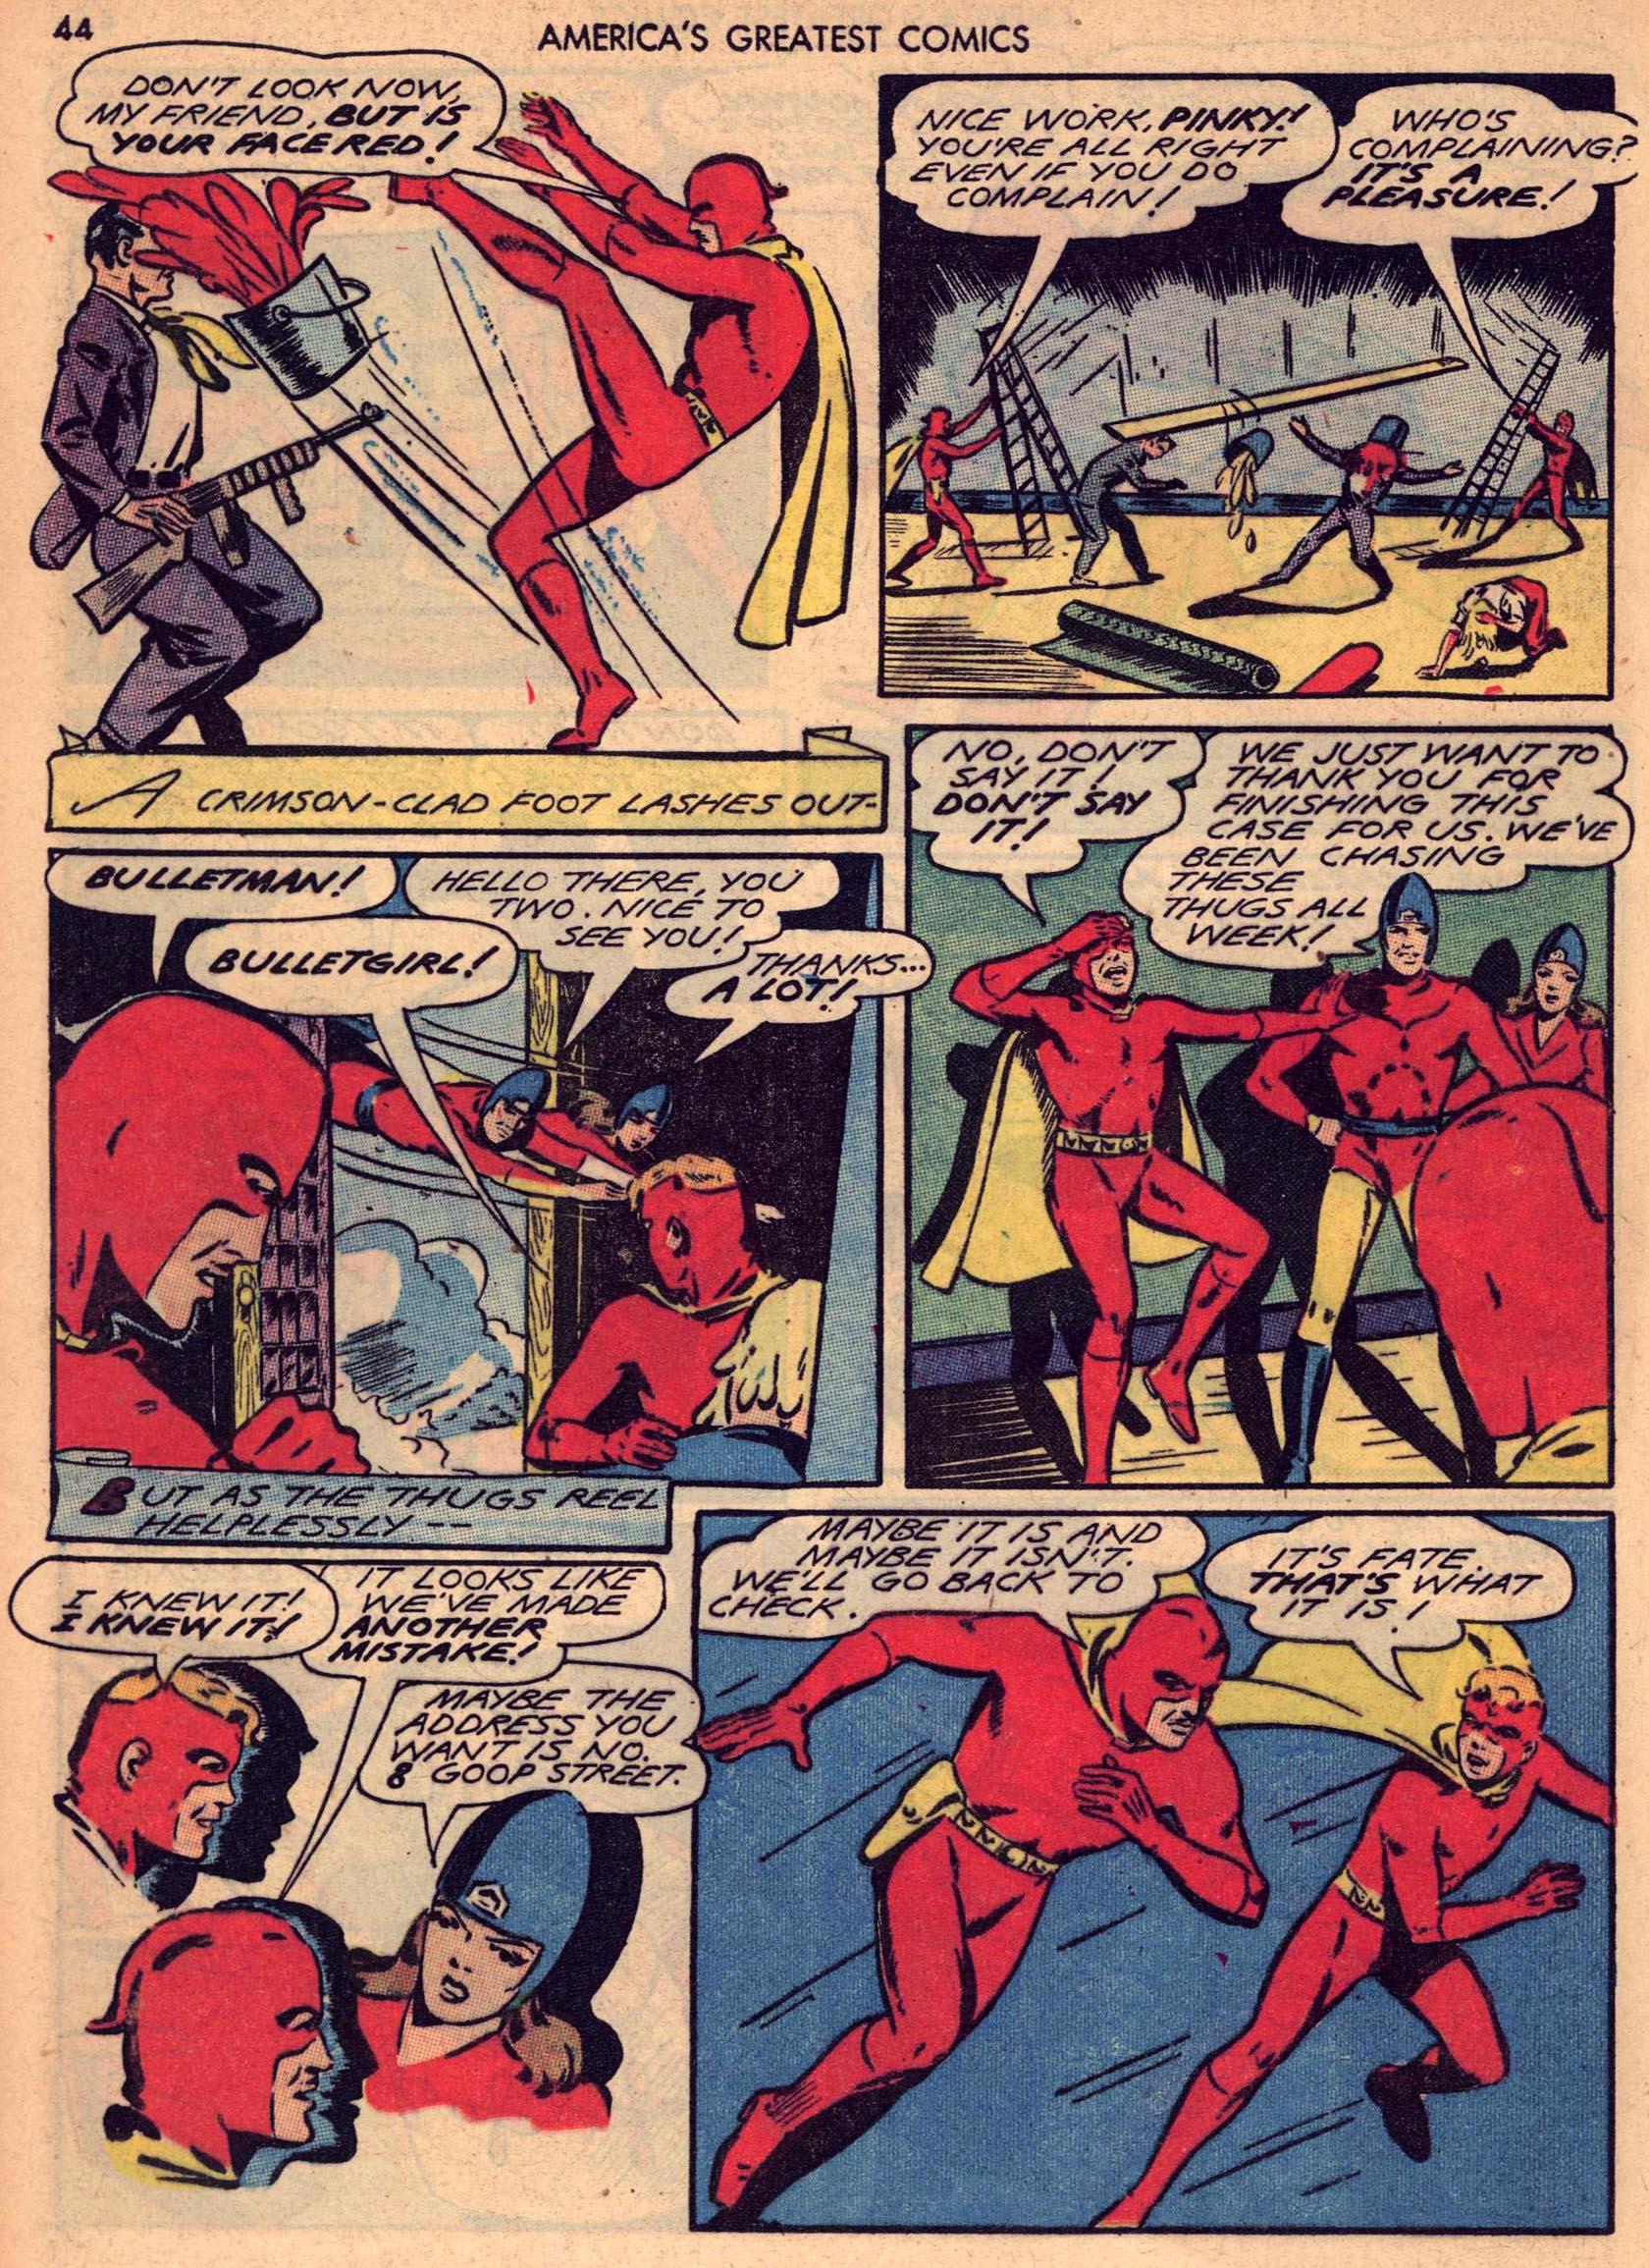 Read online America's Greatest Comics comic -  Issue #7 - 43